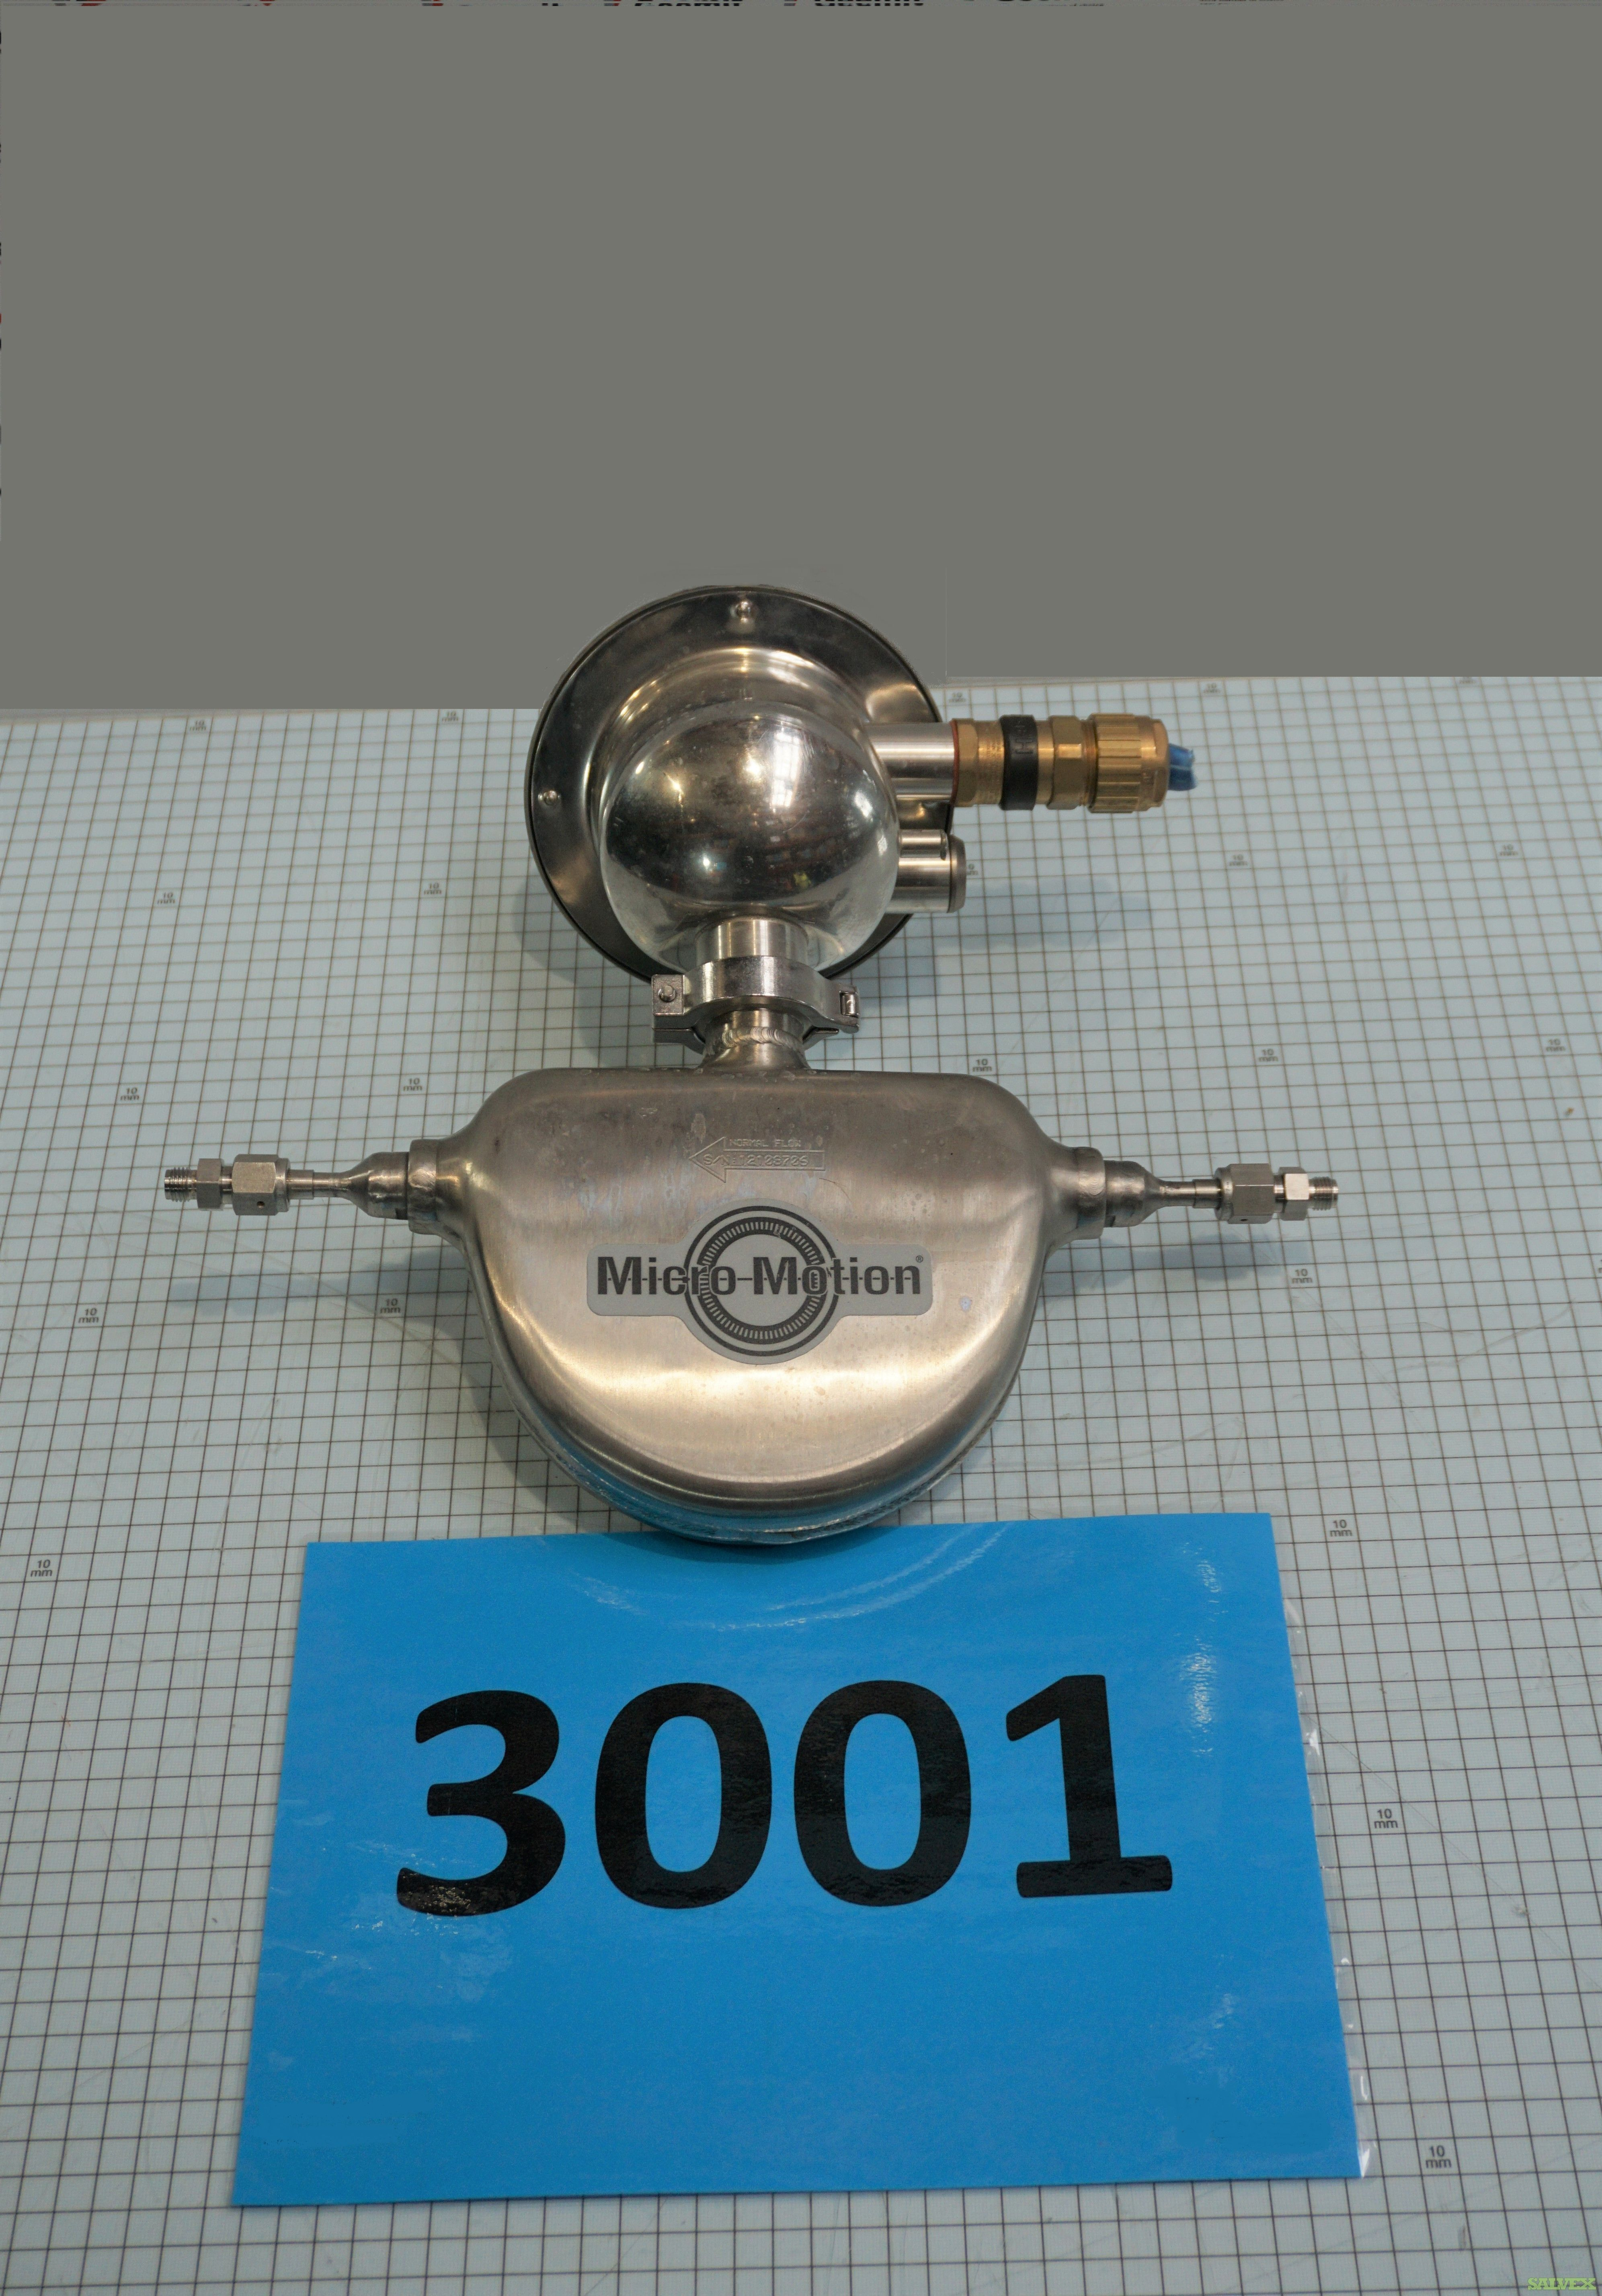 Emerson Micro Motion Mass Flow Sensors (88 pieces)